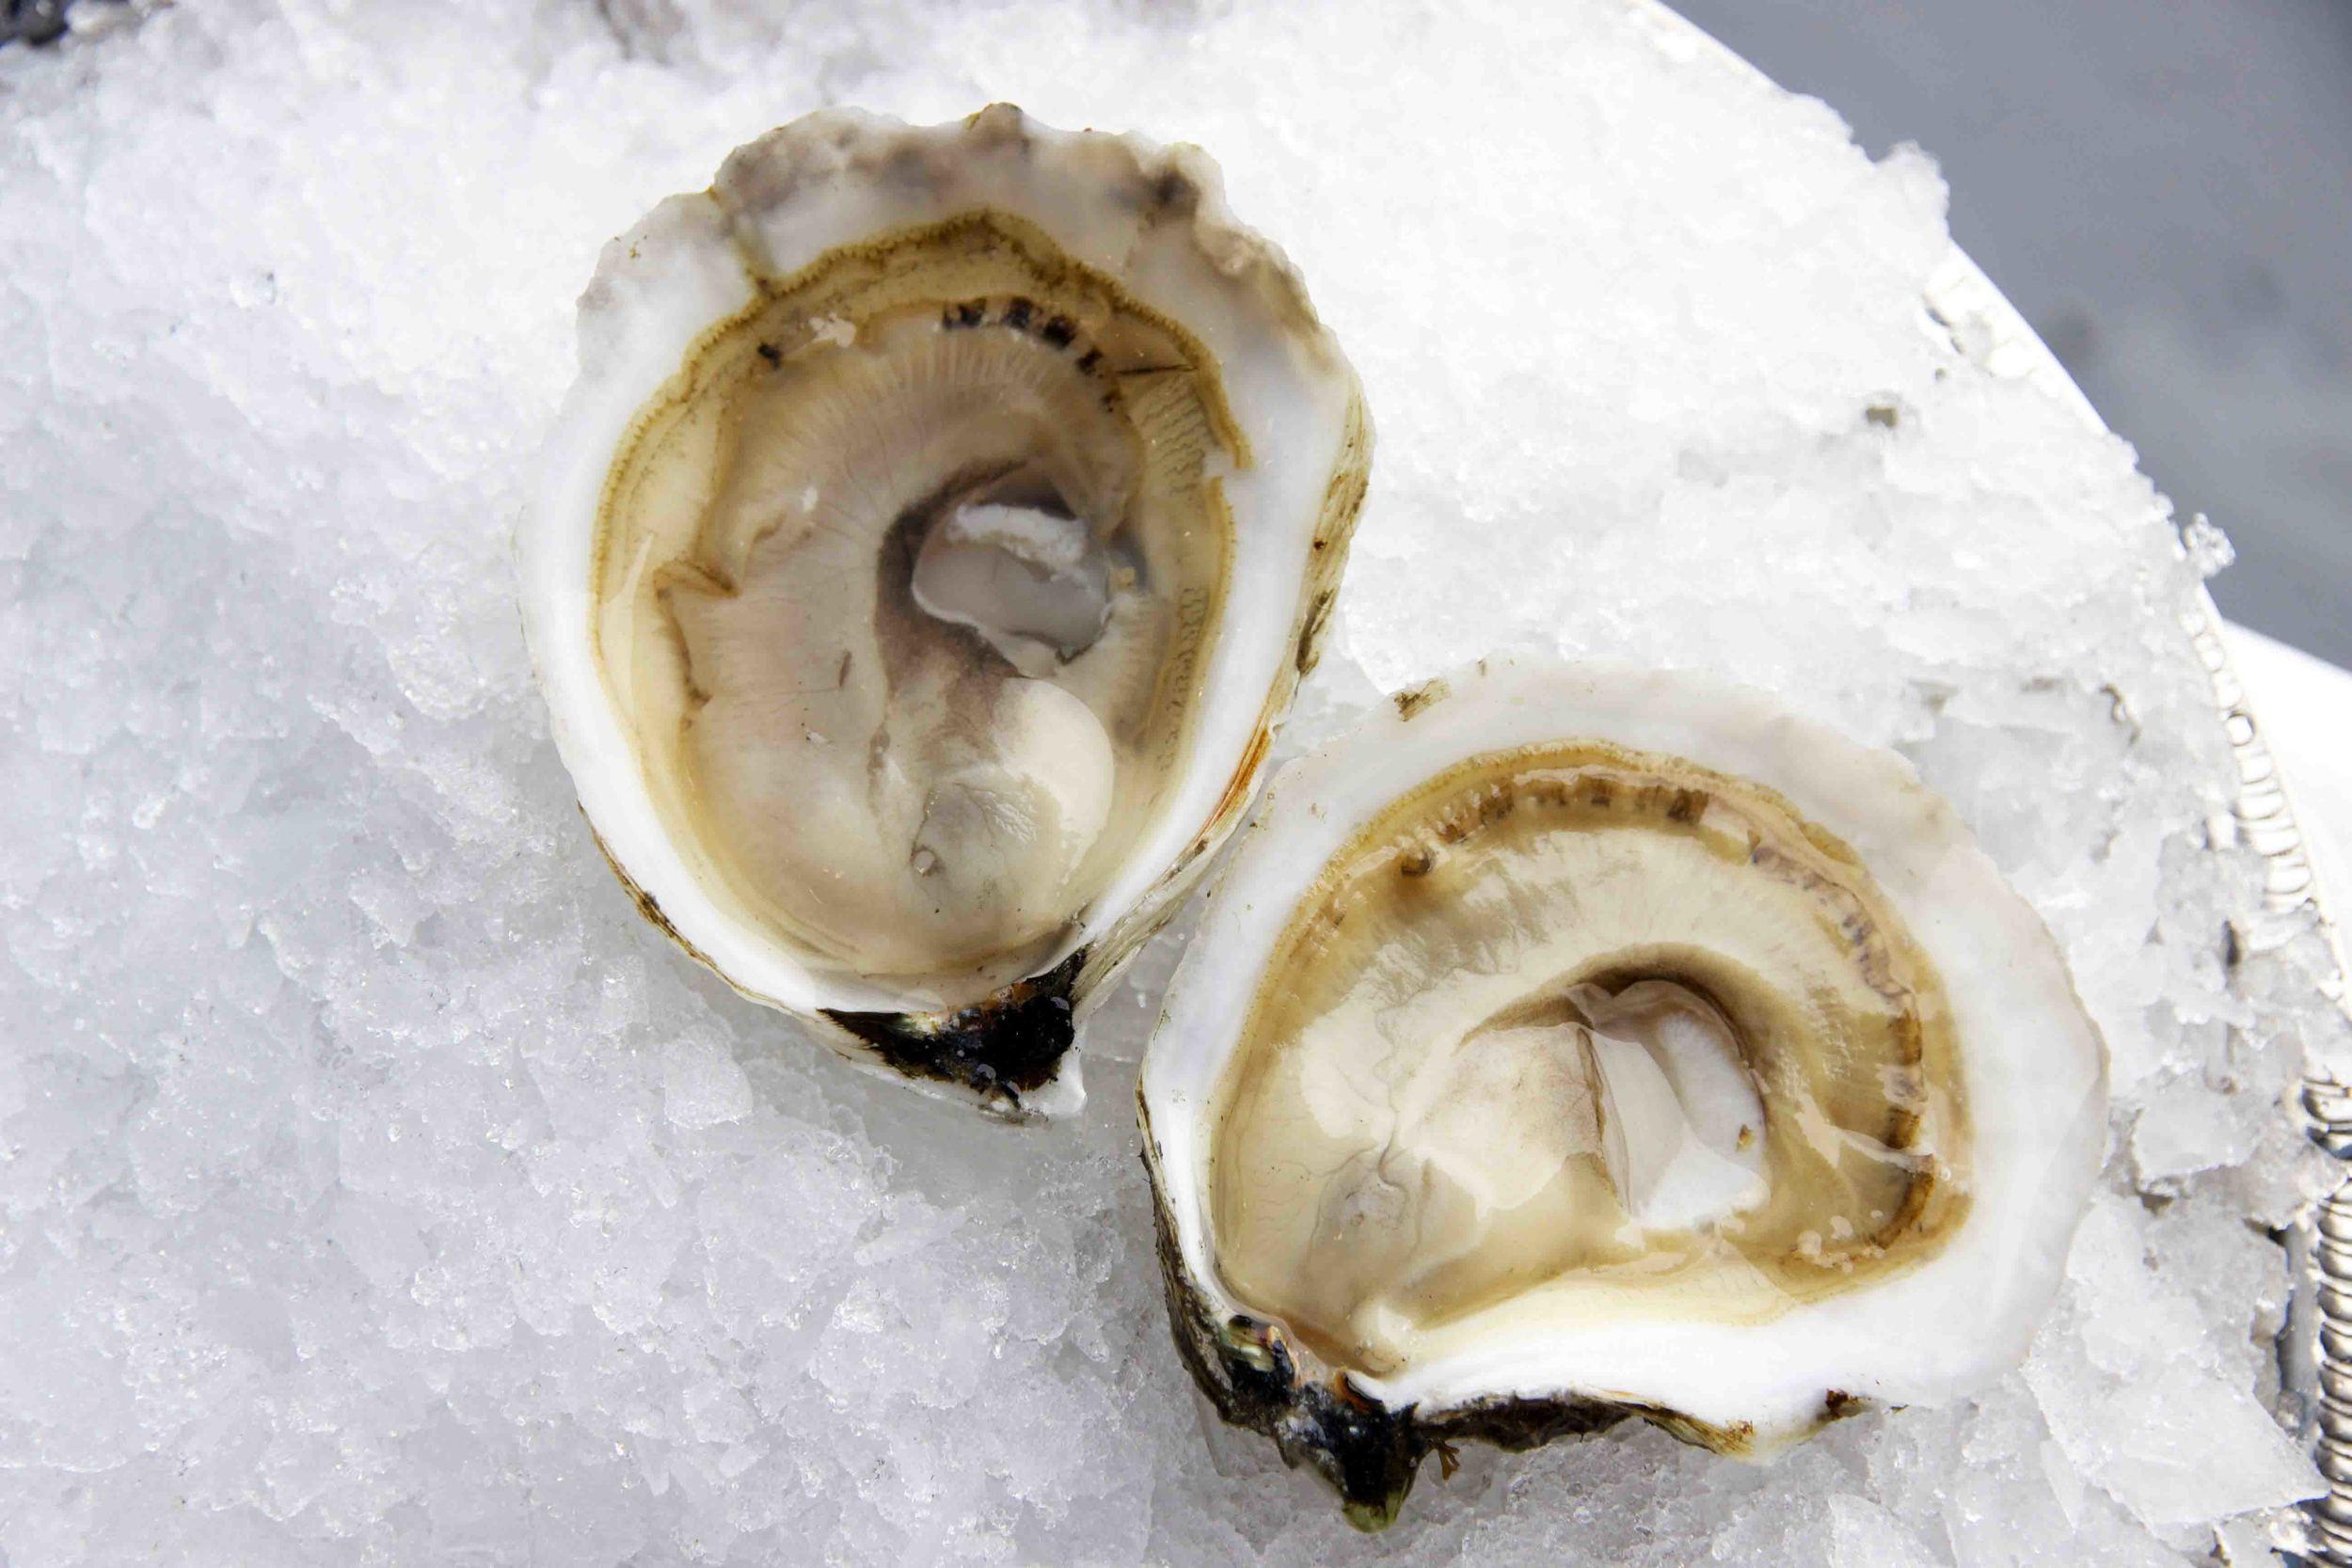 Pangea Shellfish Standish Shore Oyster Open LR.jpg